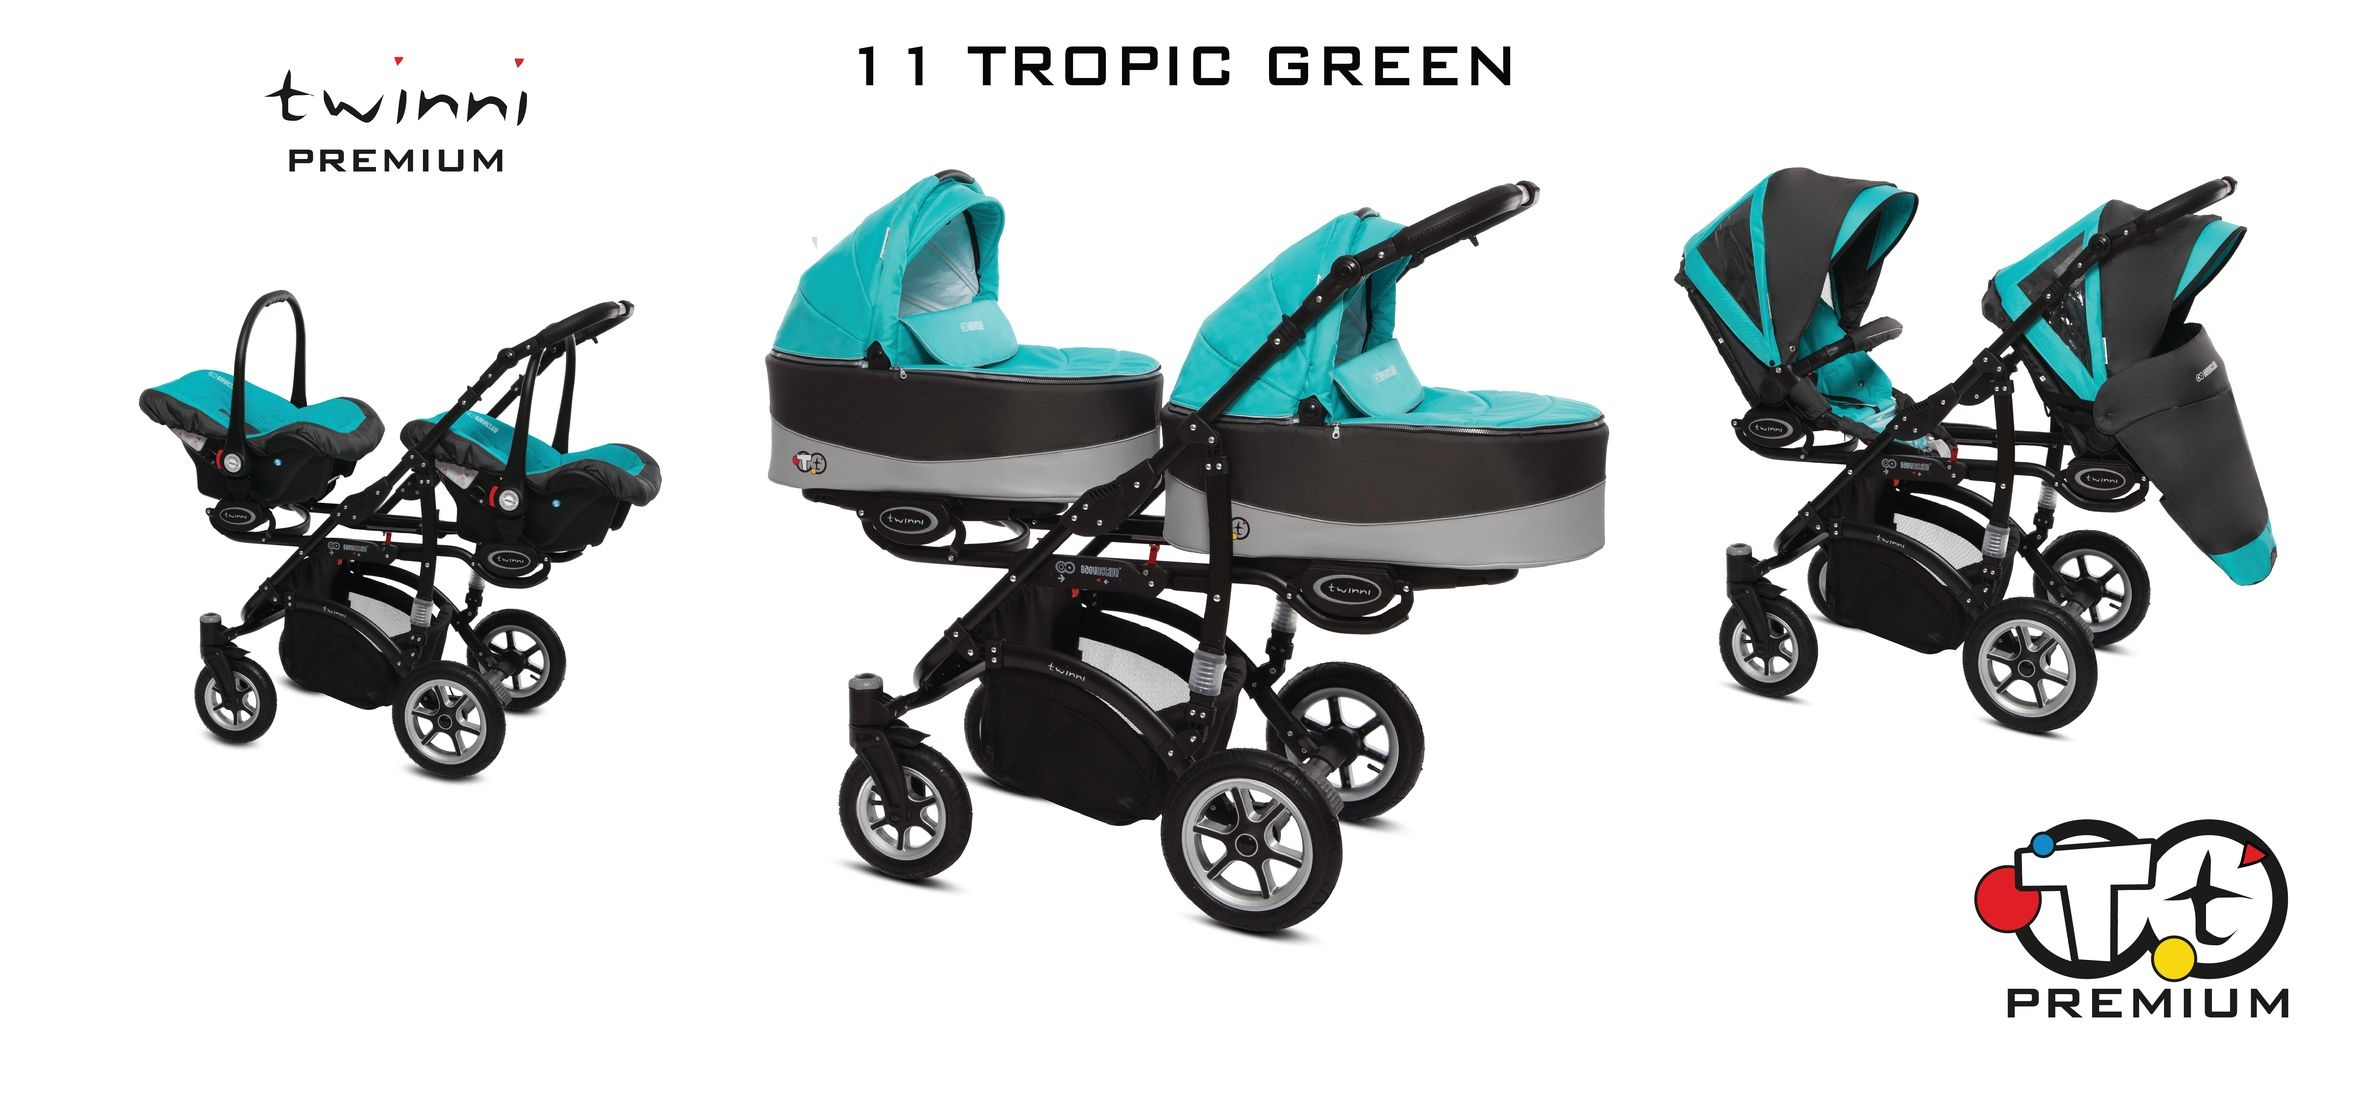 Tropic Green